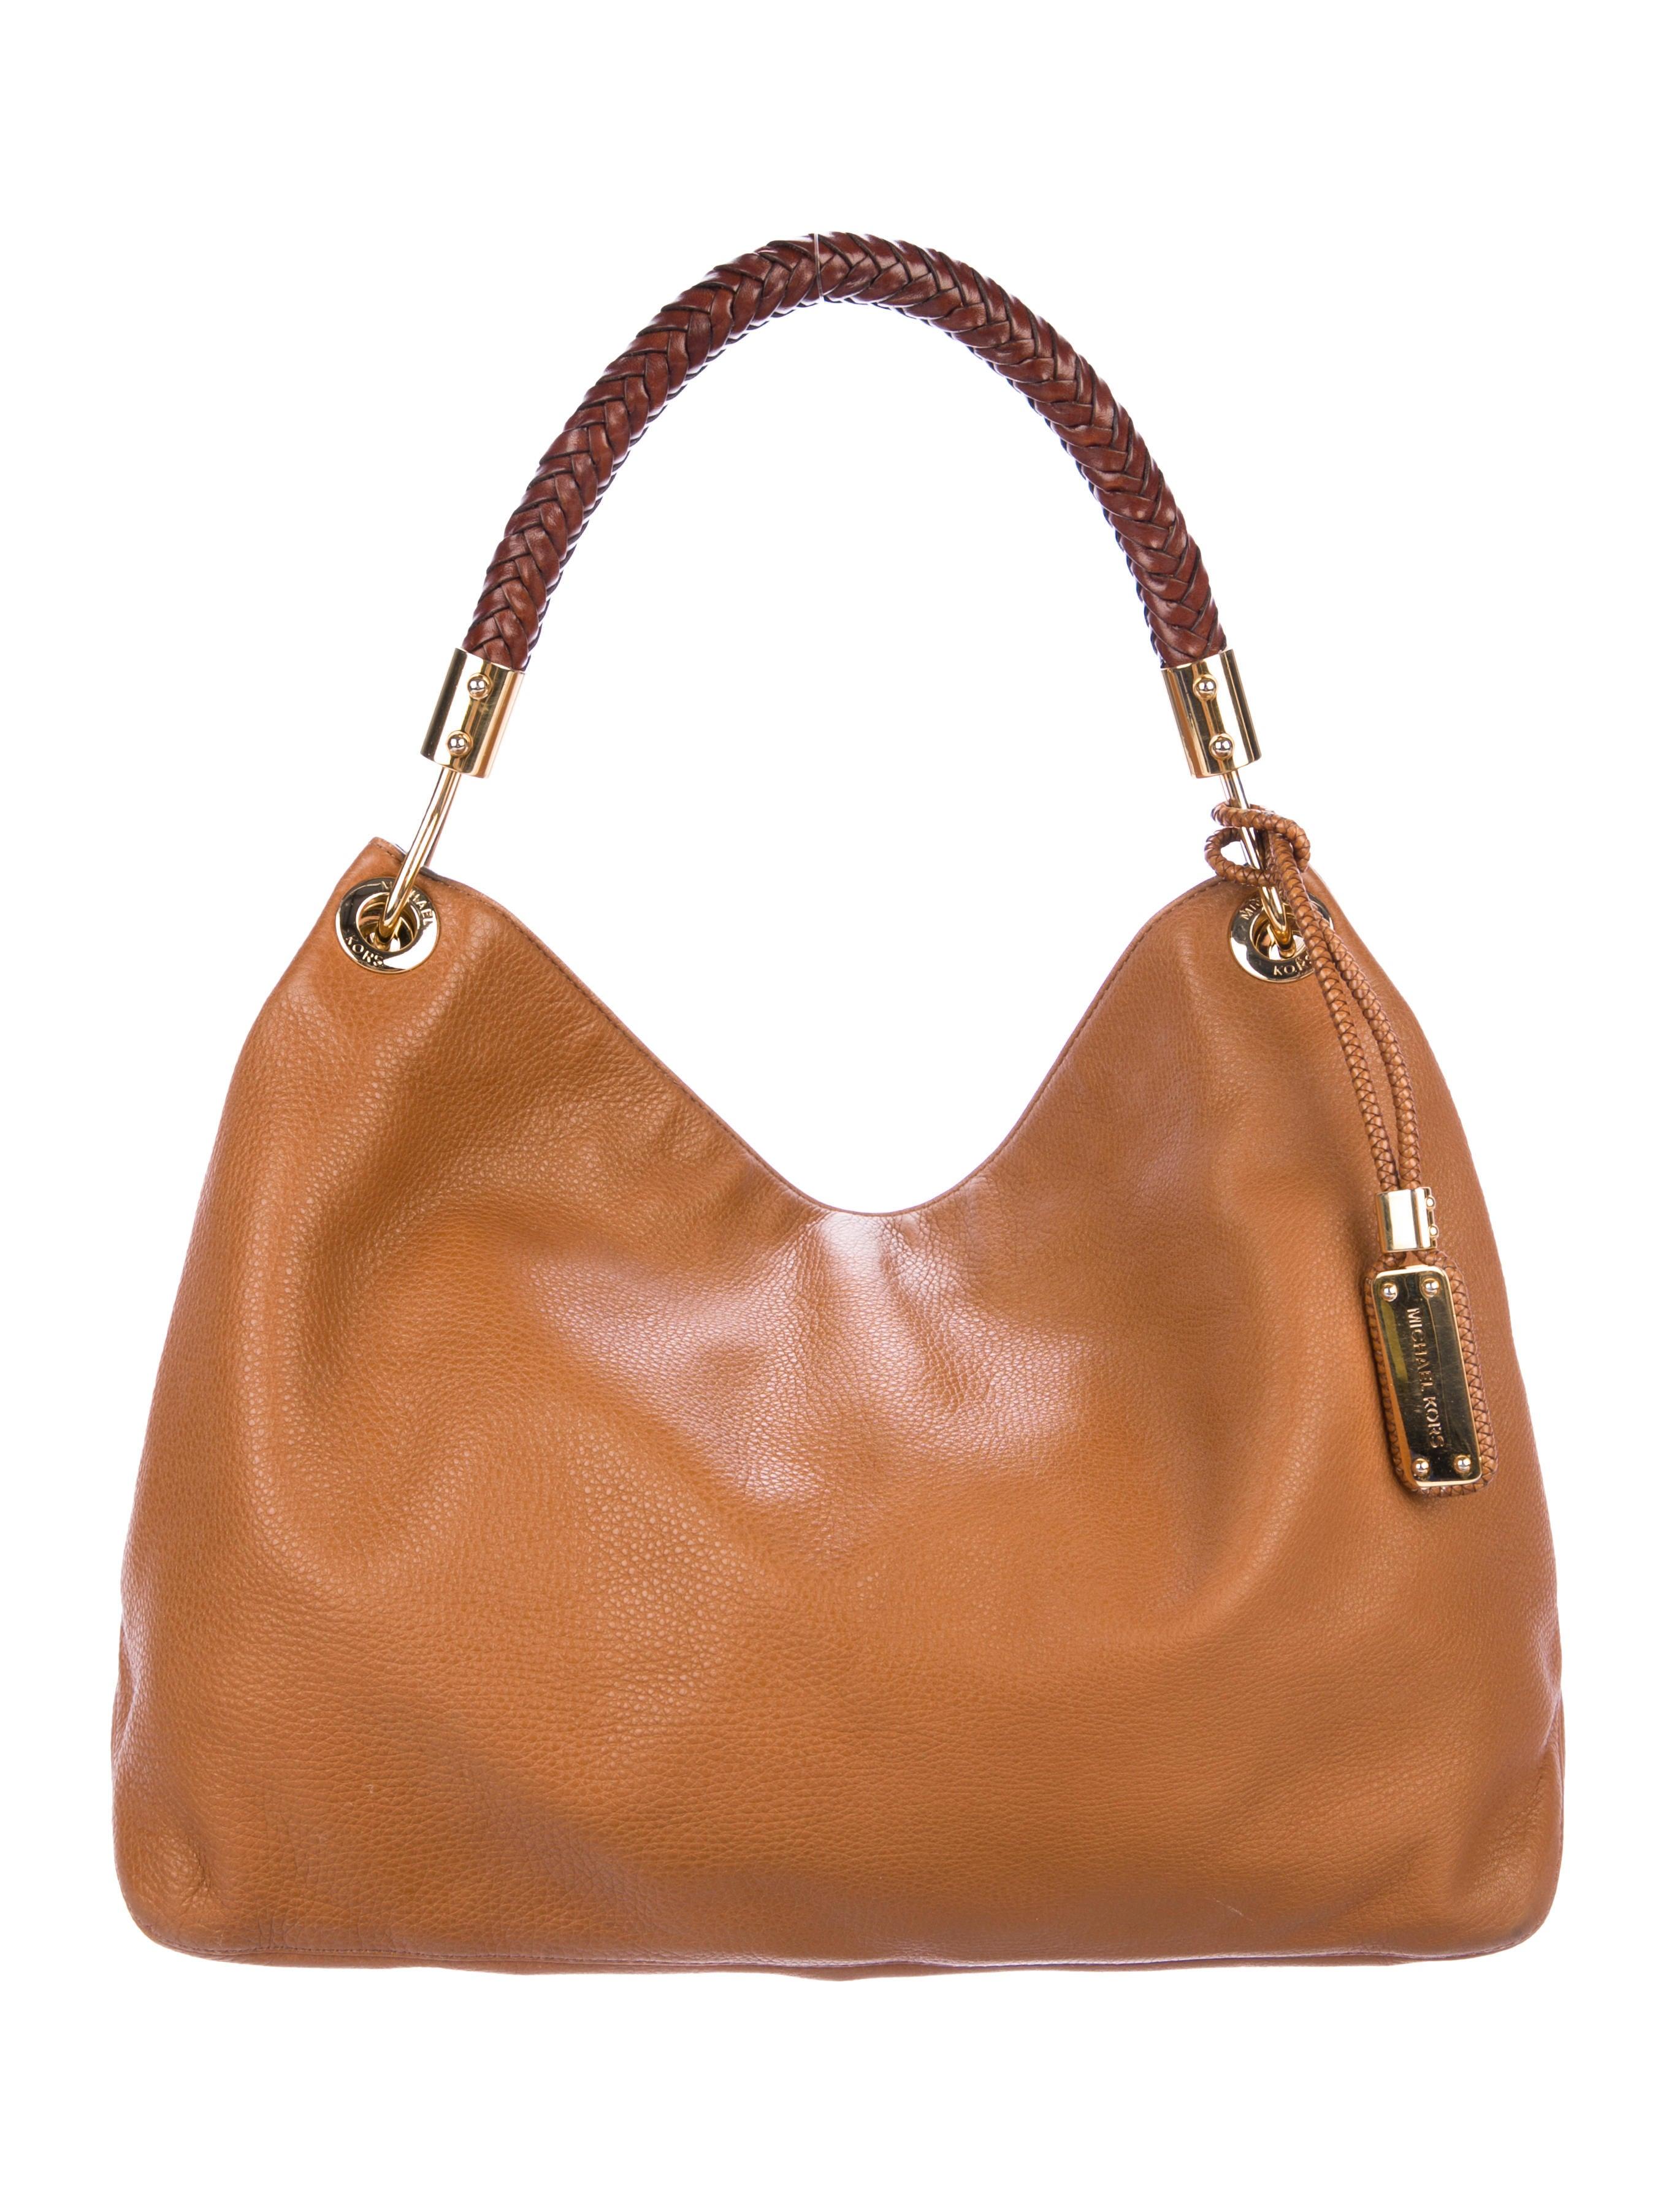 3bc69b41ee30 Michael Kors Leather Skorpios Hobo - Handbags - MIC70911 | The RealReal